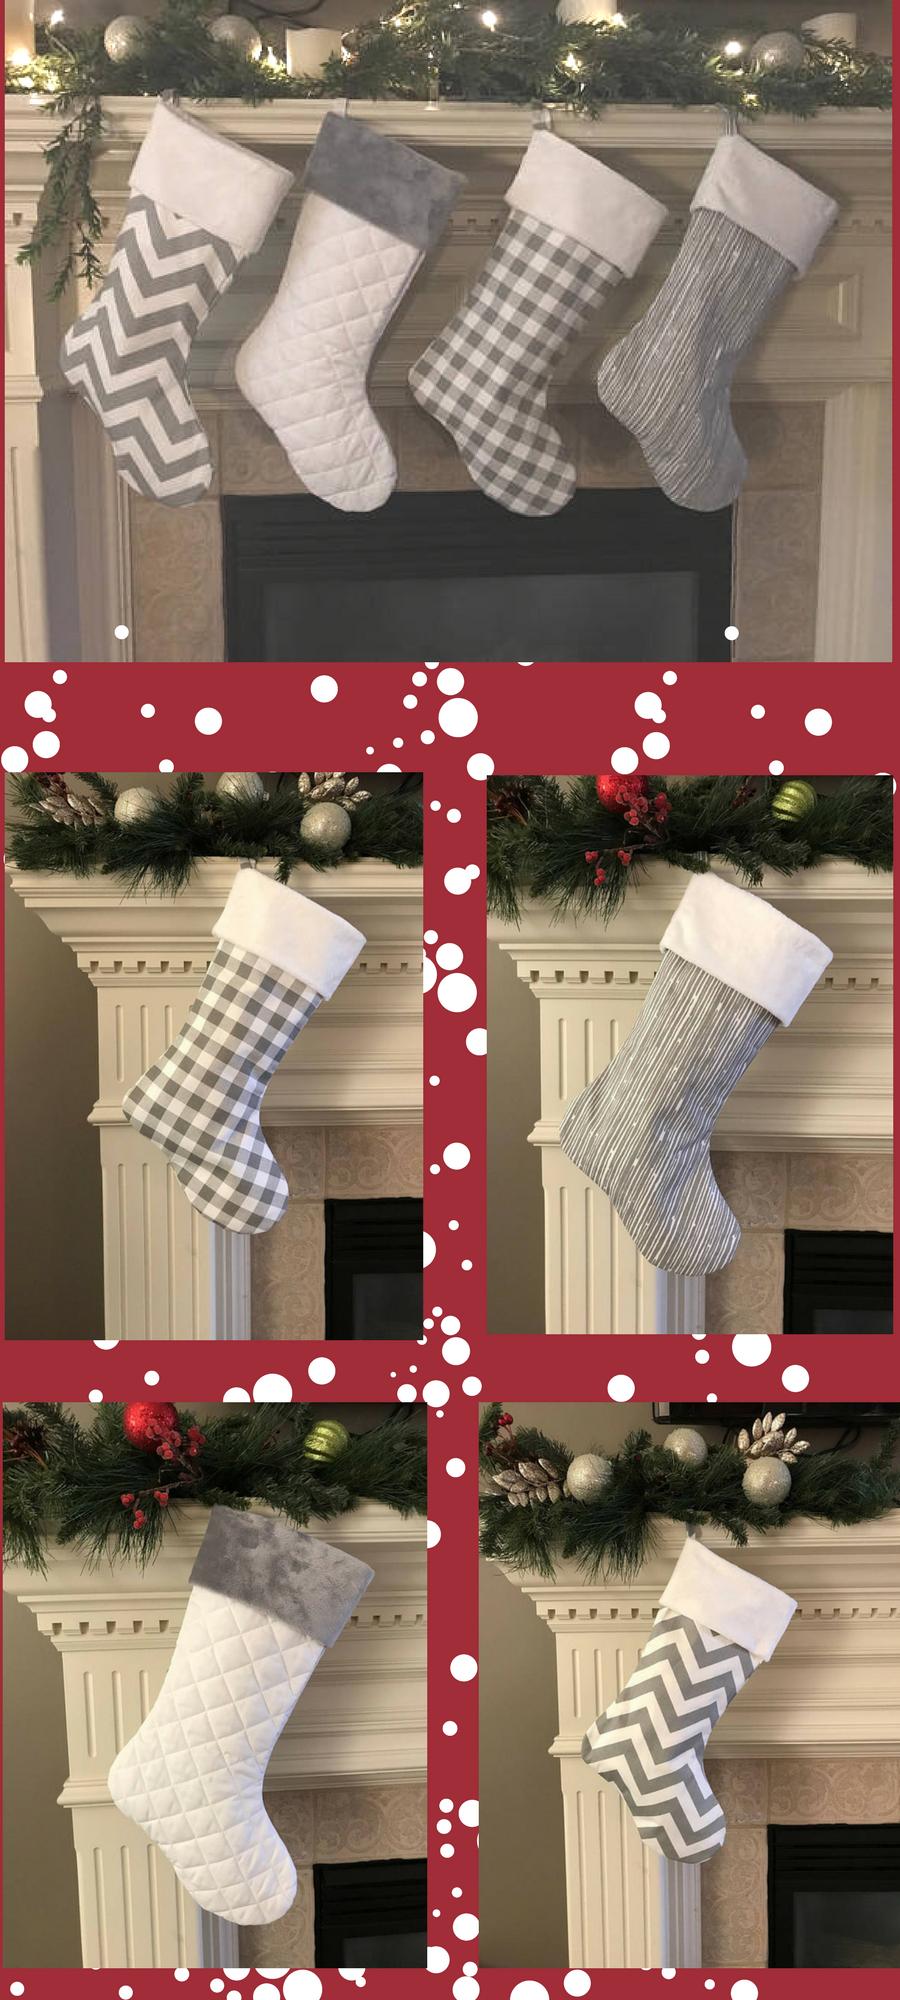 Gray Christmas Stockings.I Love These Family Christmas Stockings In Gray Farmhouse